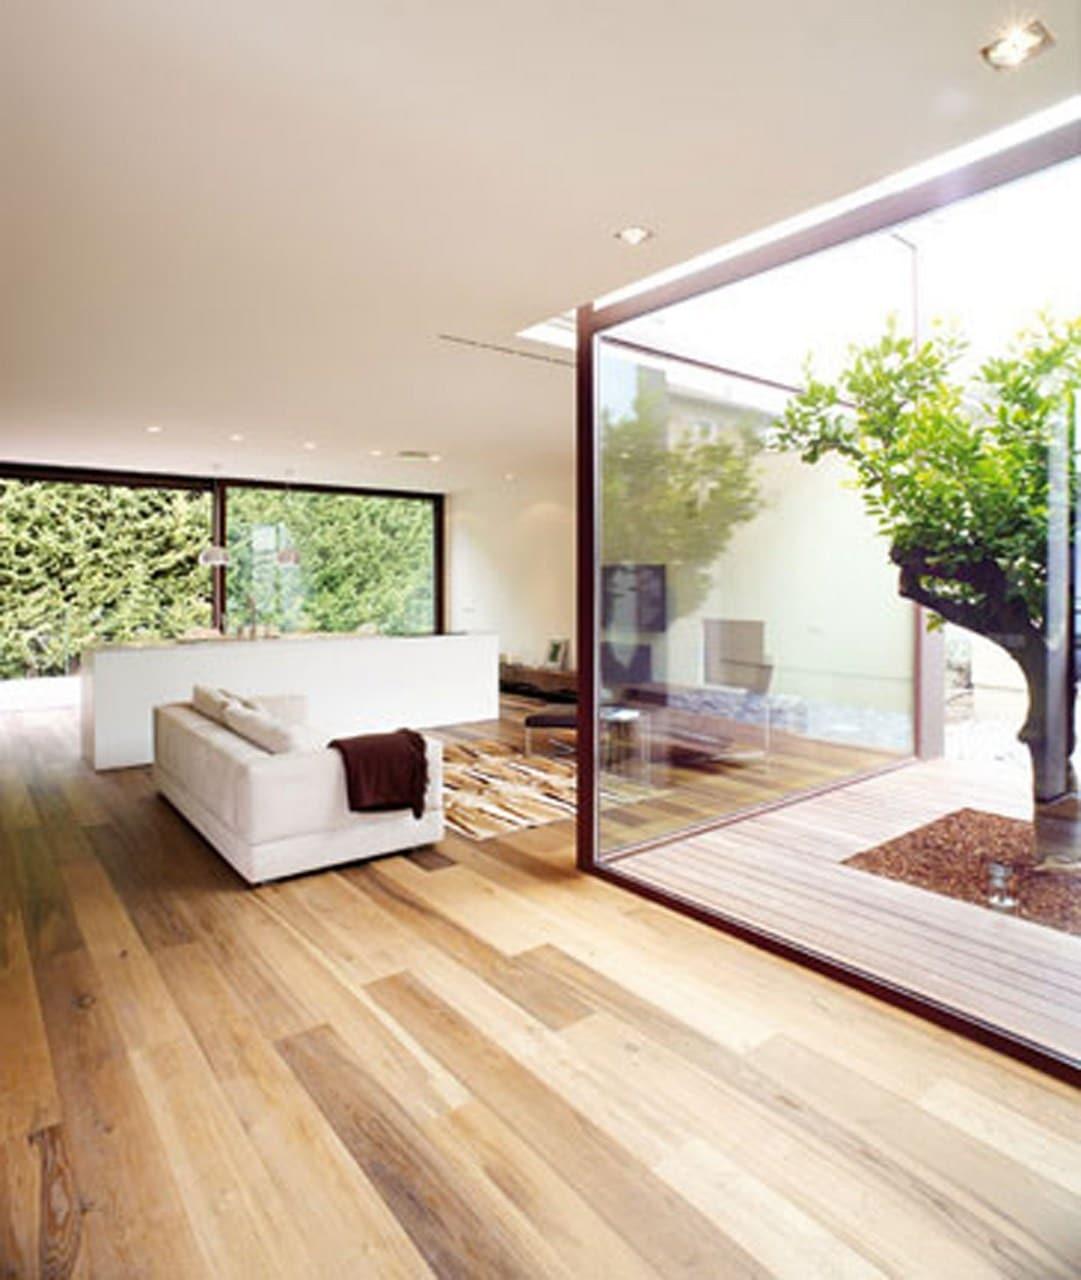 Planos de casa peque a de un piso con cerco perim trico alto for Jardines interiores de casas modernas